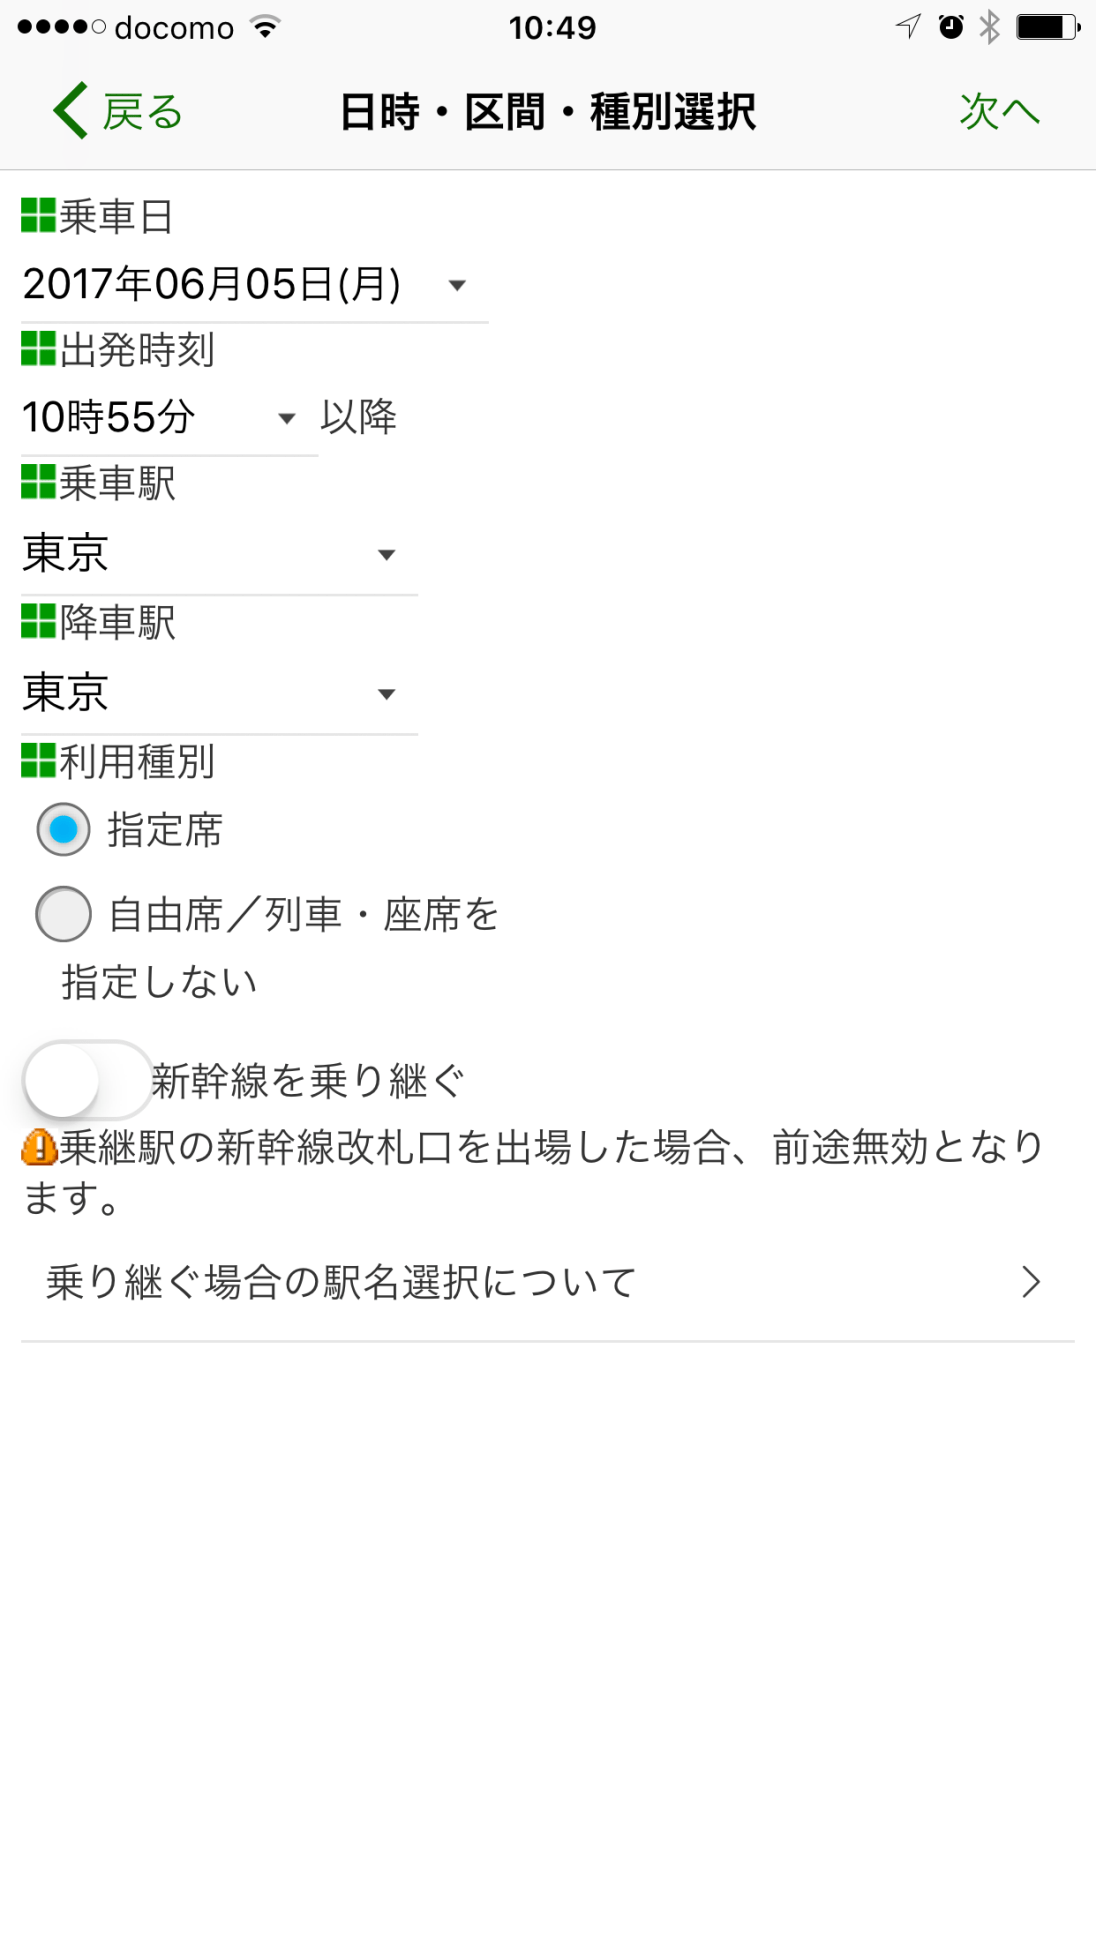 Select the Shinkansen station points.